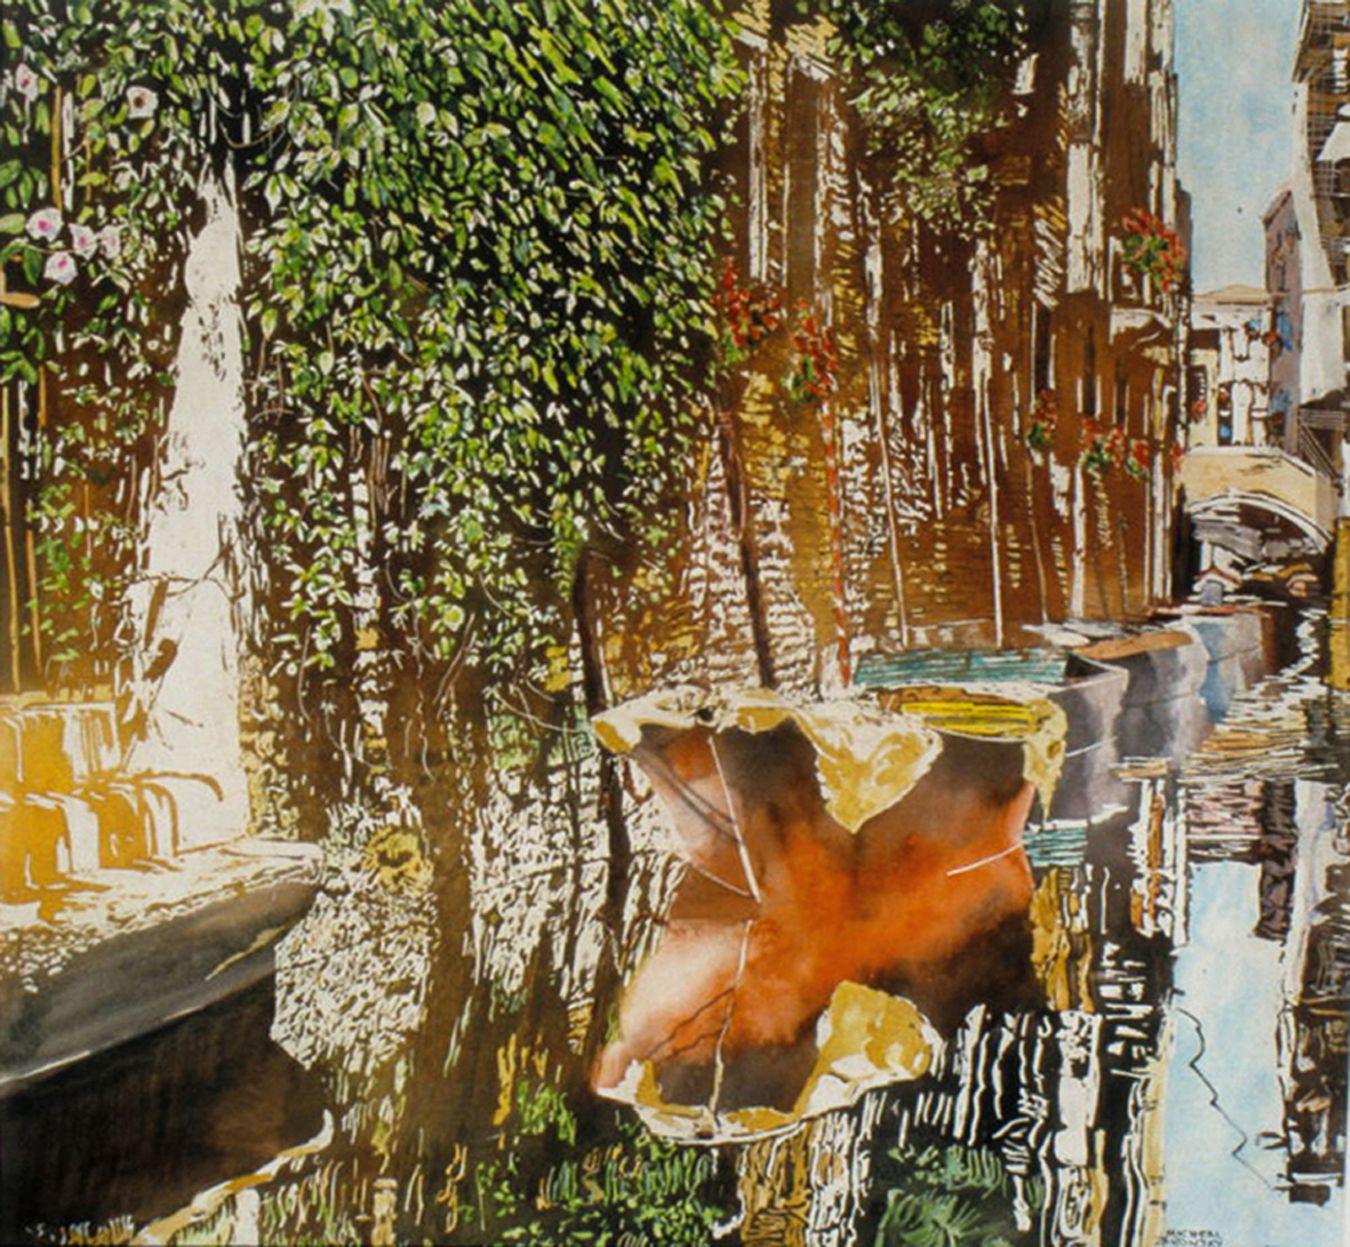 "sunlit canal rio di malpaga venice 26"" x 28"" micheal zarowsky / watercolour on arches paper / available $2500.00"